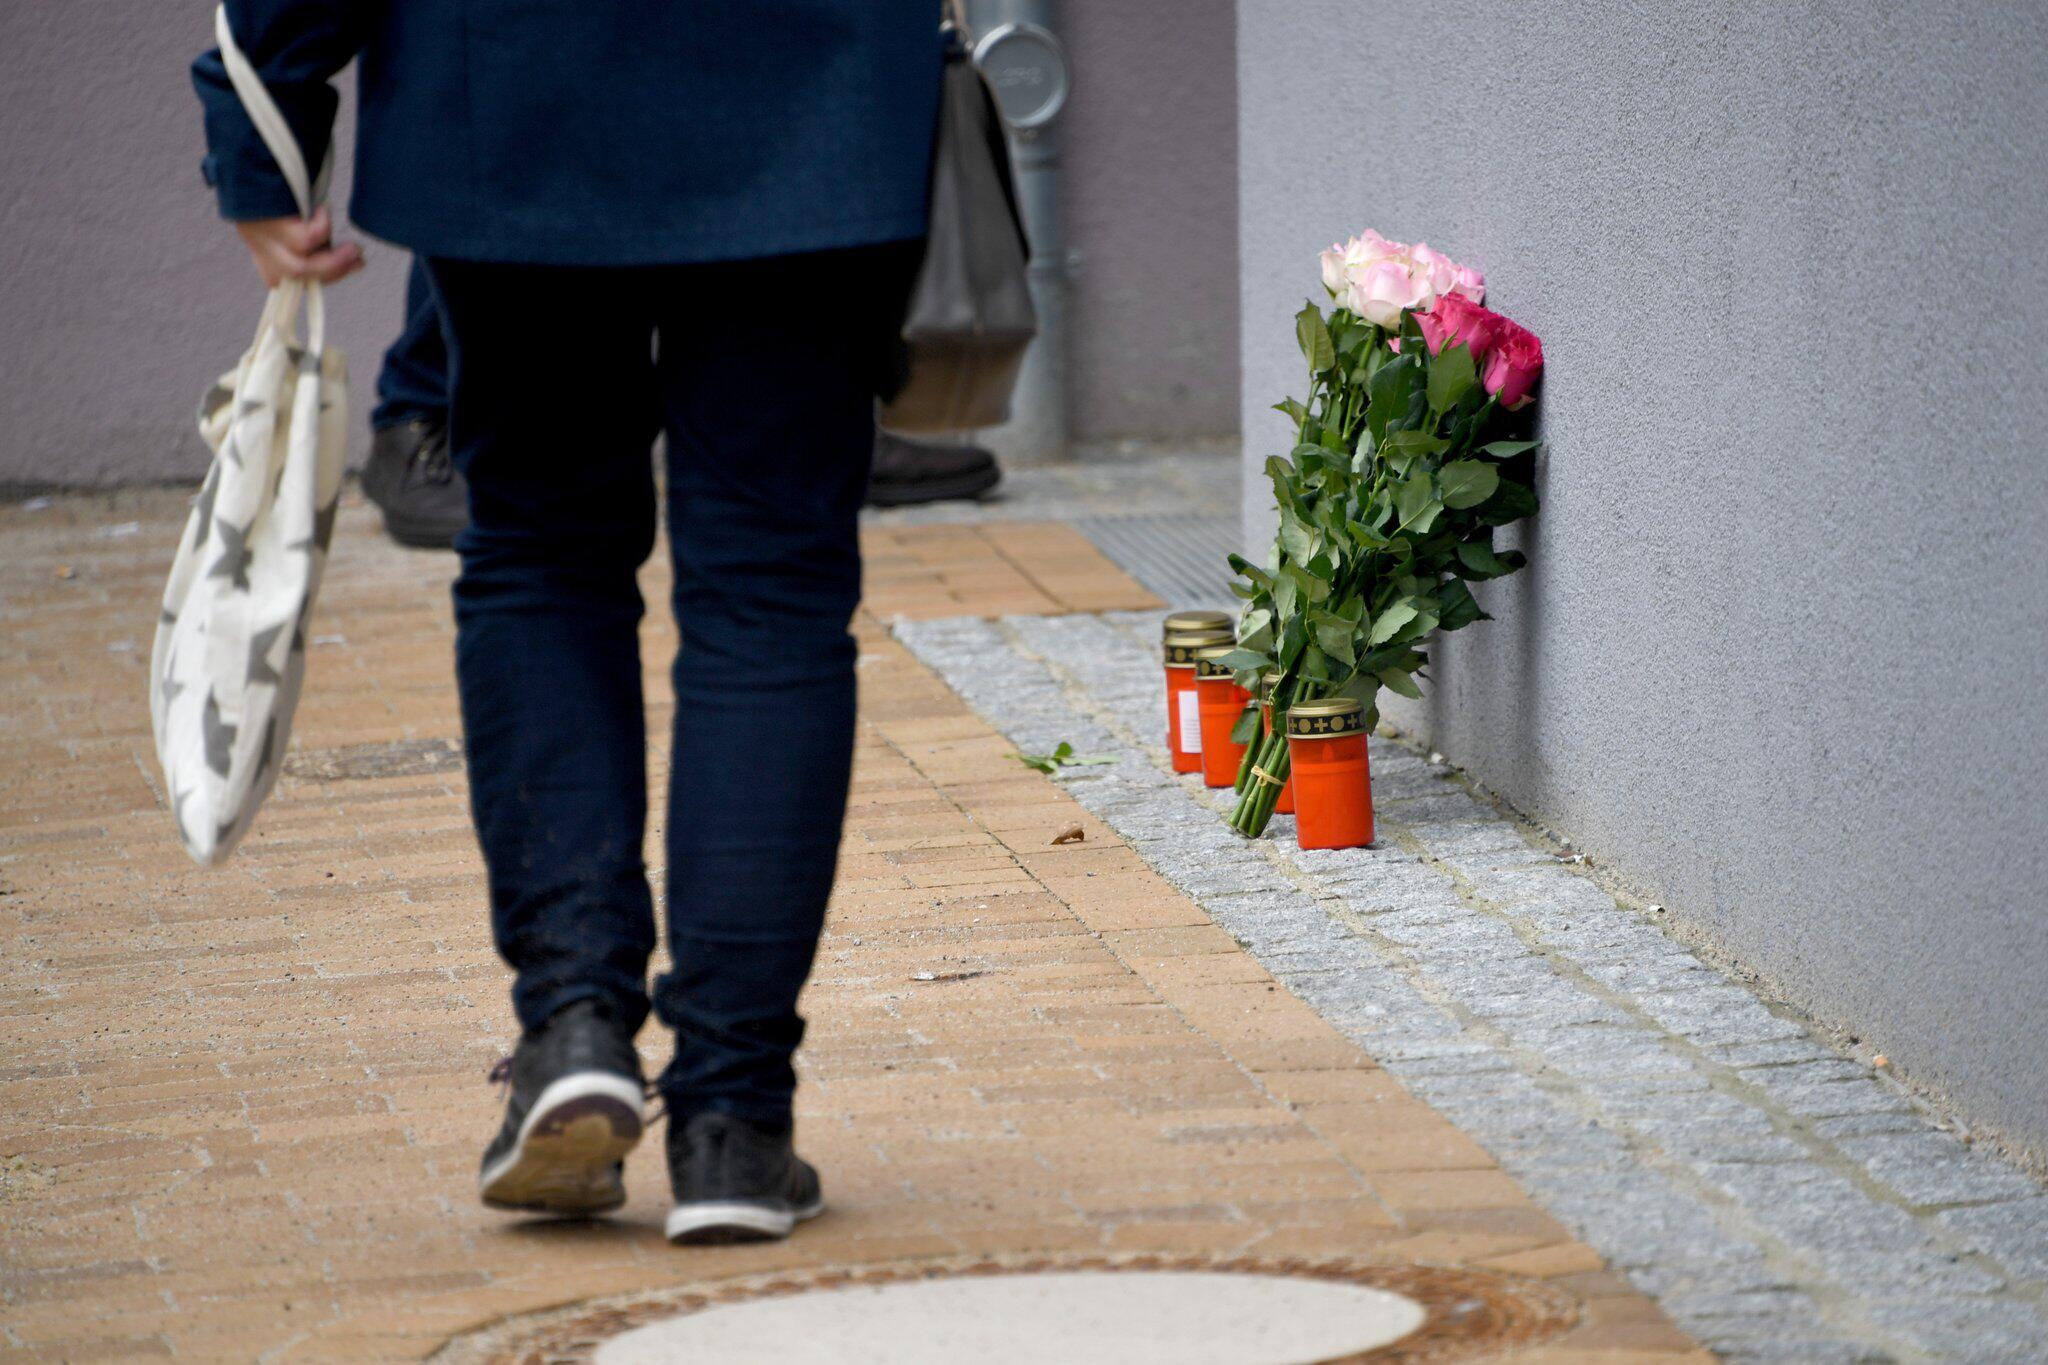 Bild zu After deadly knife attack in Flensburg